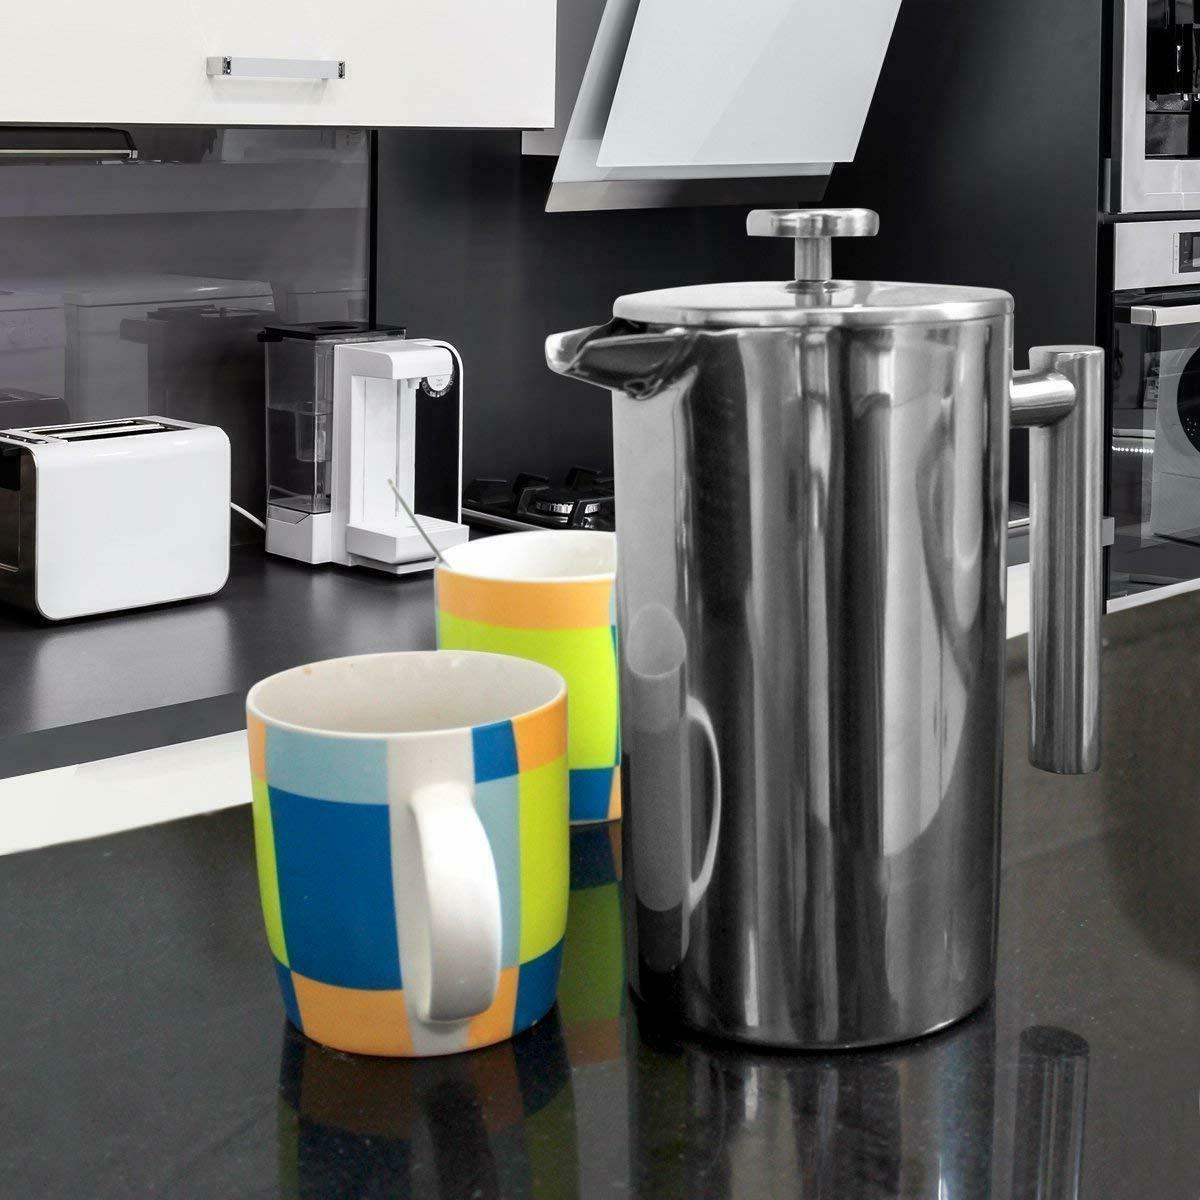 32 Oz Coffee Stainless Steel Utopia